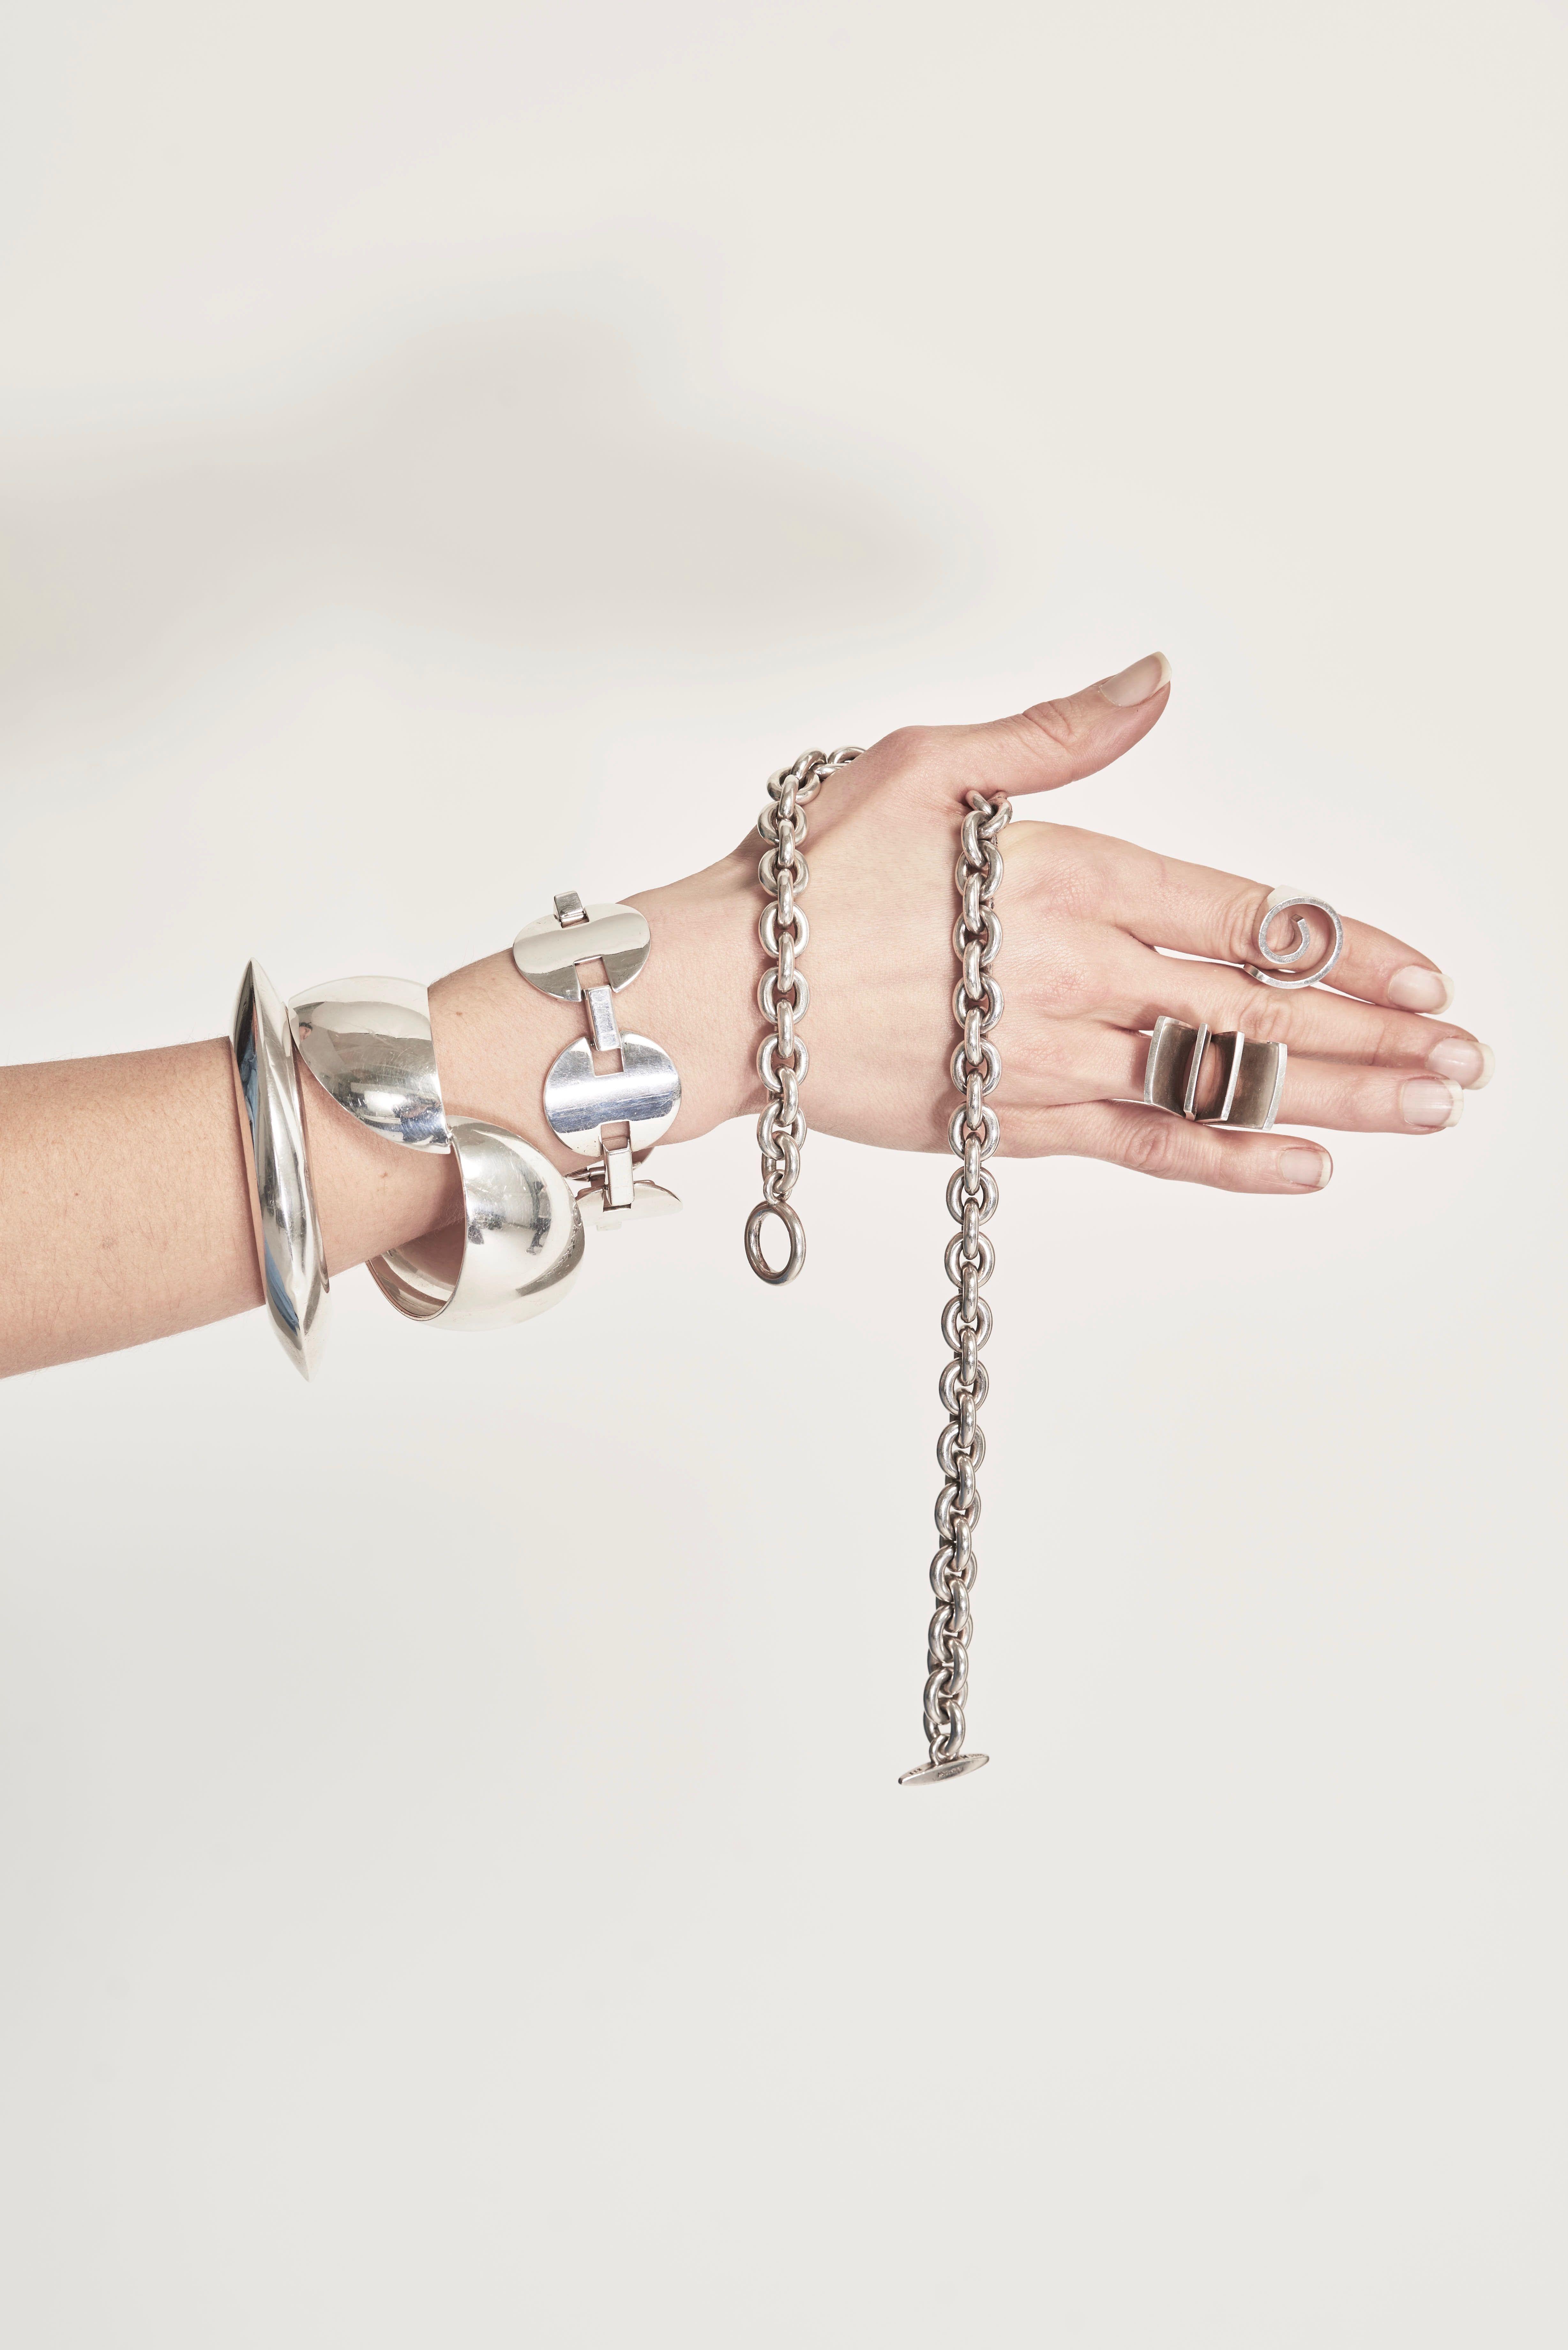 A selection of rare iconic scandinavian jewellery grasilver